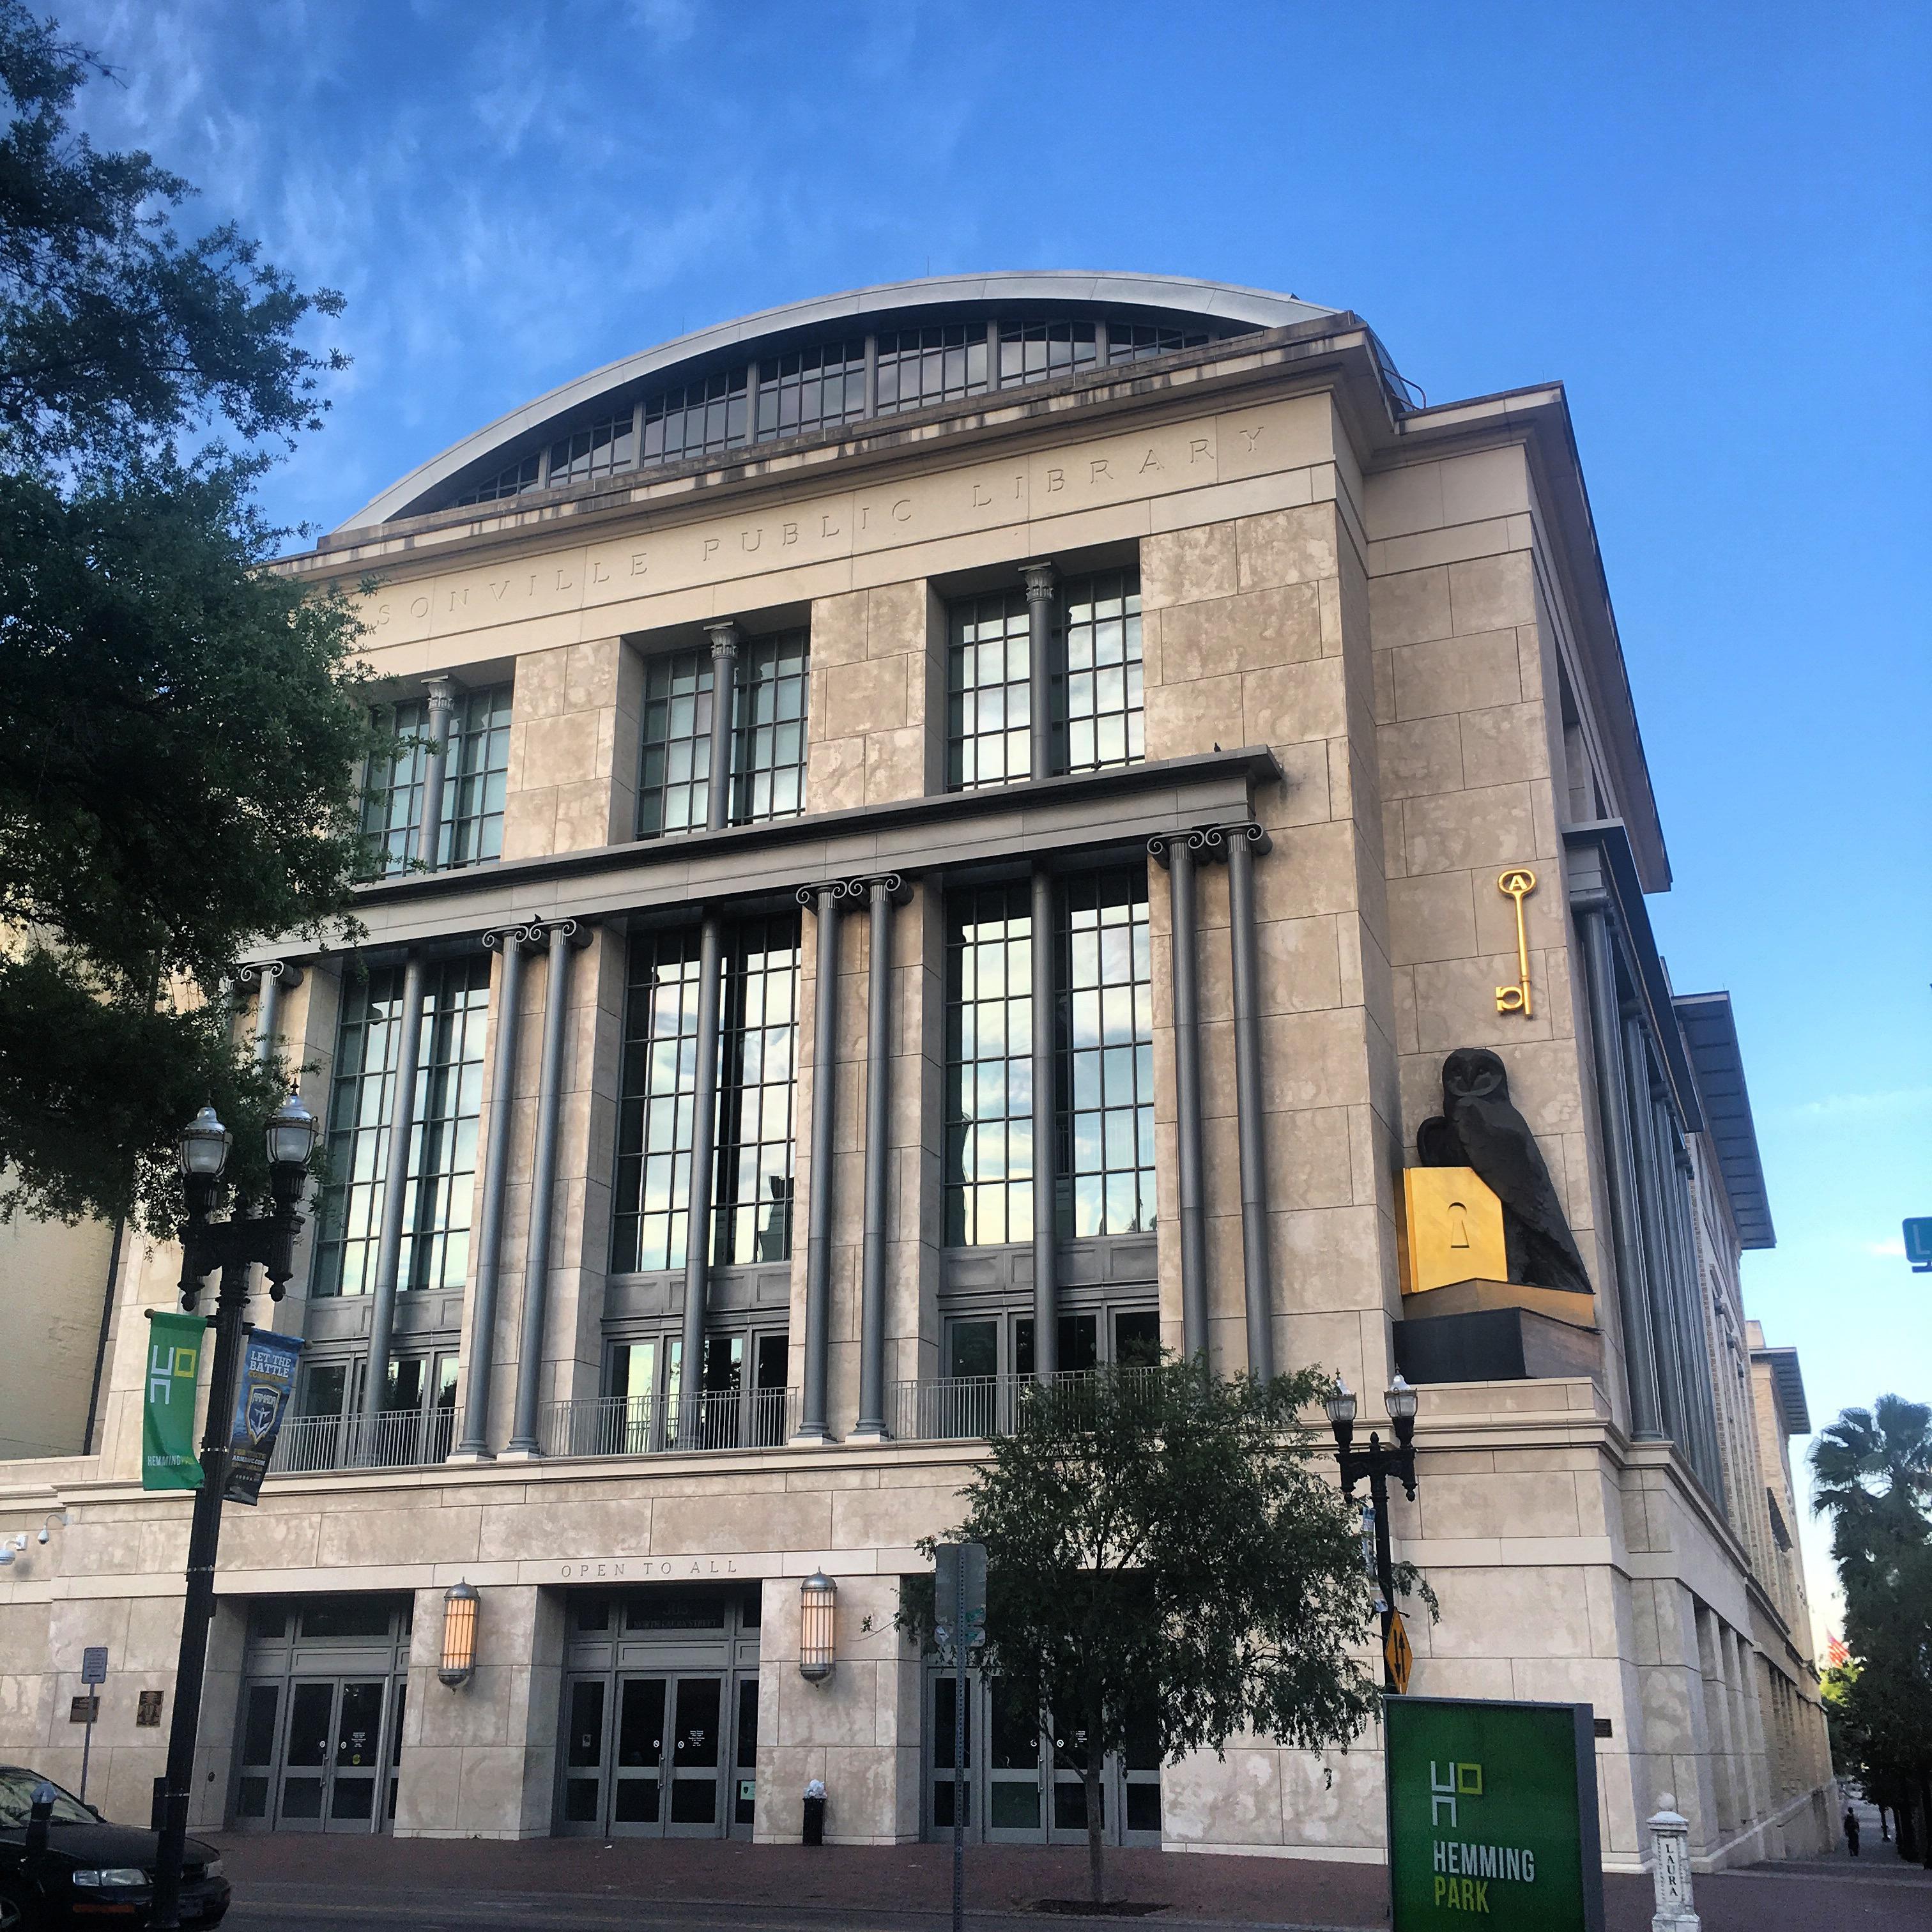 File:Jacksonville Public (Main) Library.jpg - Wikimedia Commons